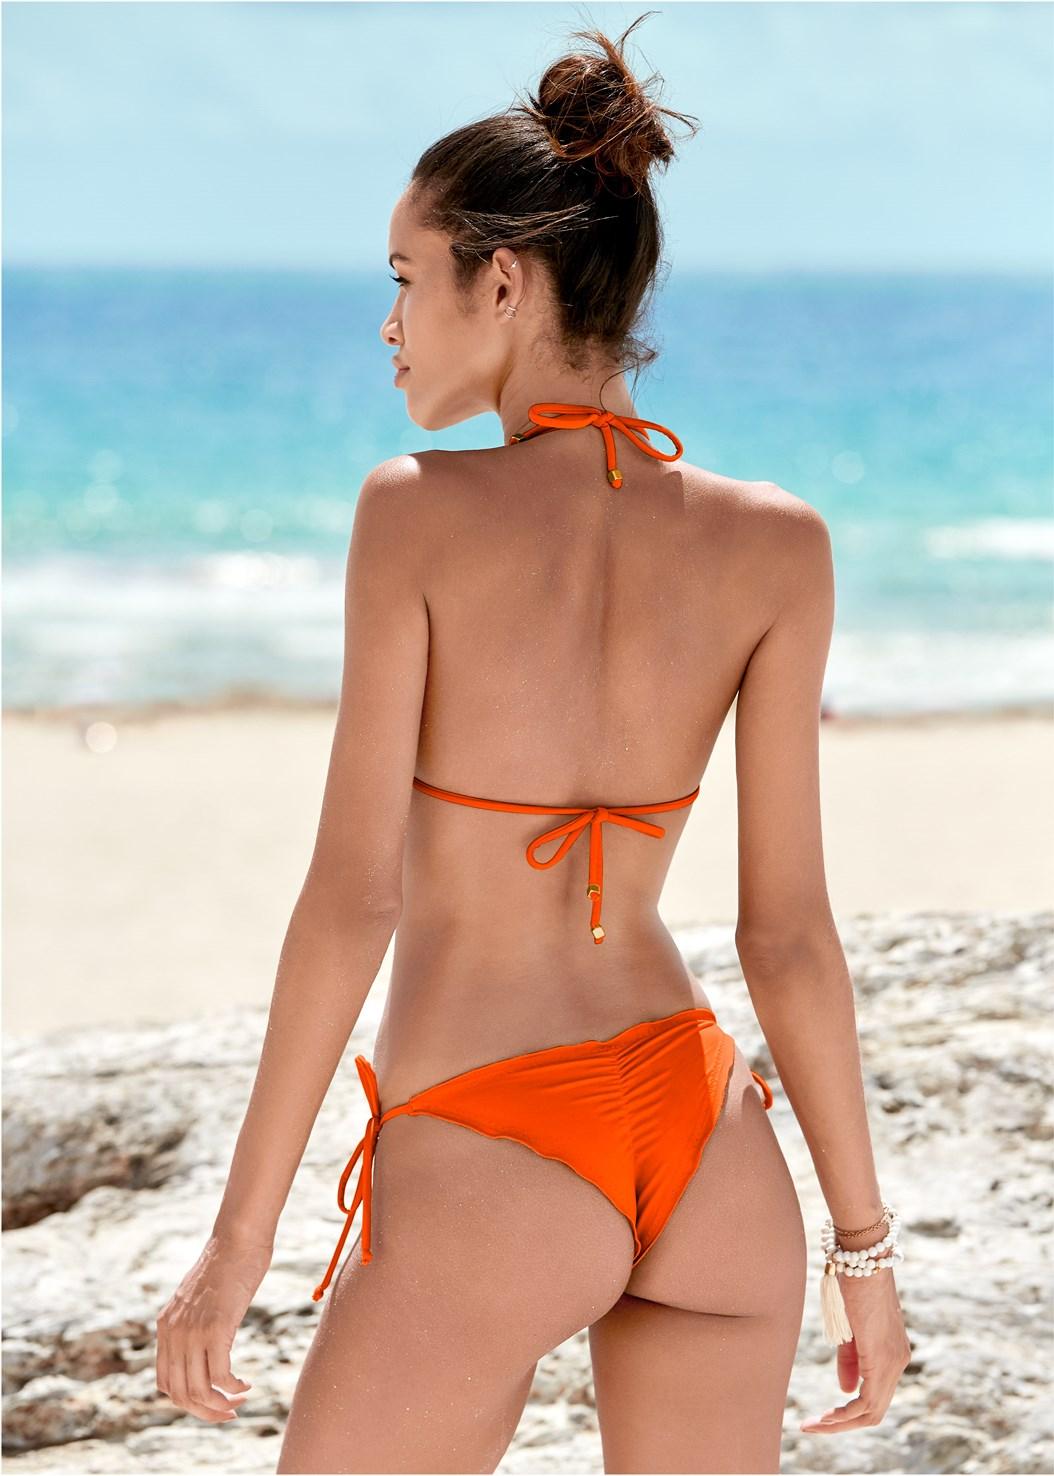 Cheeky Tie Side Bottom,Triangle String Bikini Top,Enhancer Push Up Ring Halter Triangle Top ,Goddess Enhancer Push Up Halter Top,Strappy Maxi Dress,Circle Basket Wooden Bag